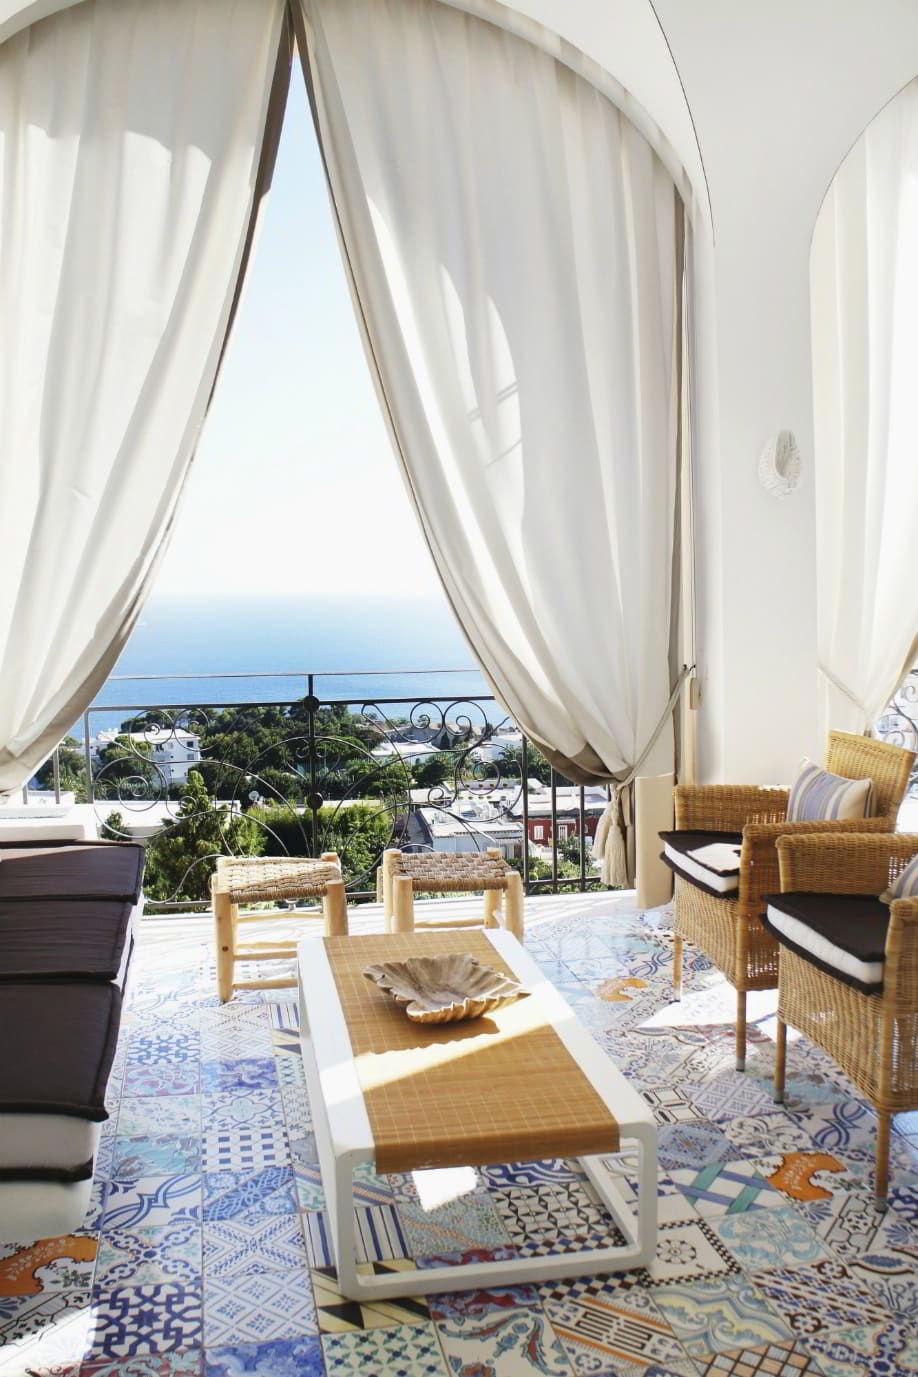 Dalani, Stile Mediterraneo, Mediterraneo, Stile, Casa, Made in Italy